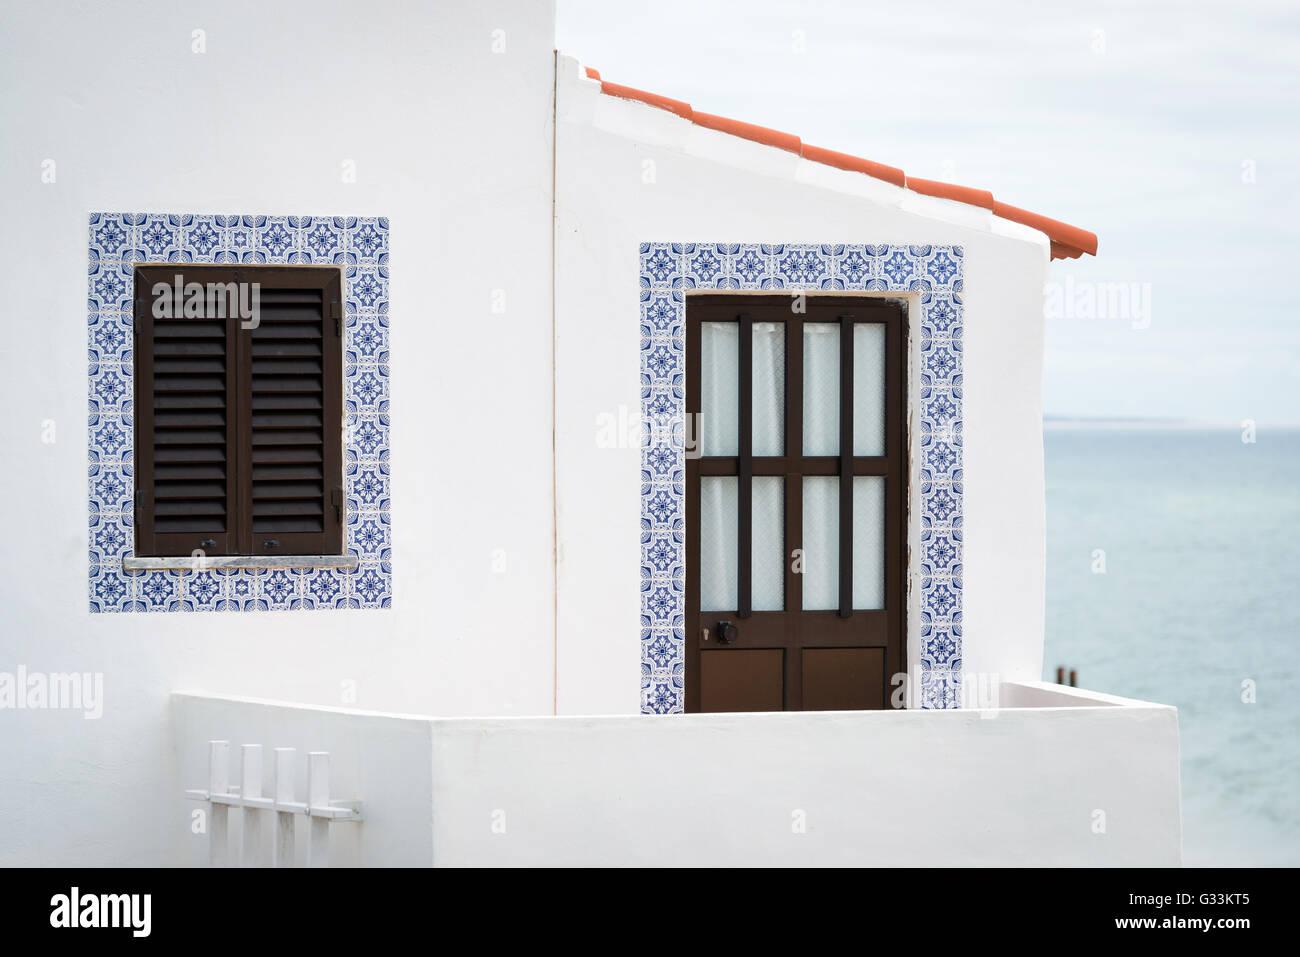 Door and window of house with Azulejos tiles around in Albufeira, Algarve region, Portugal - Stock Image